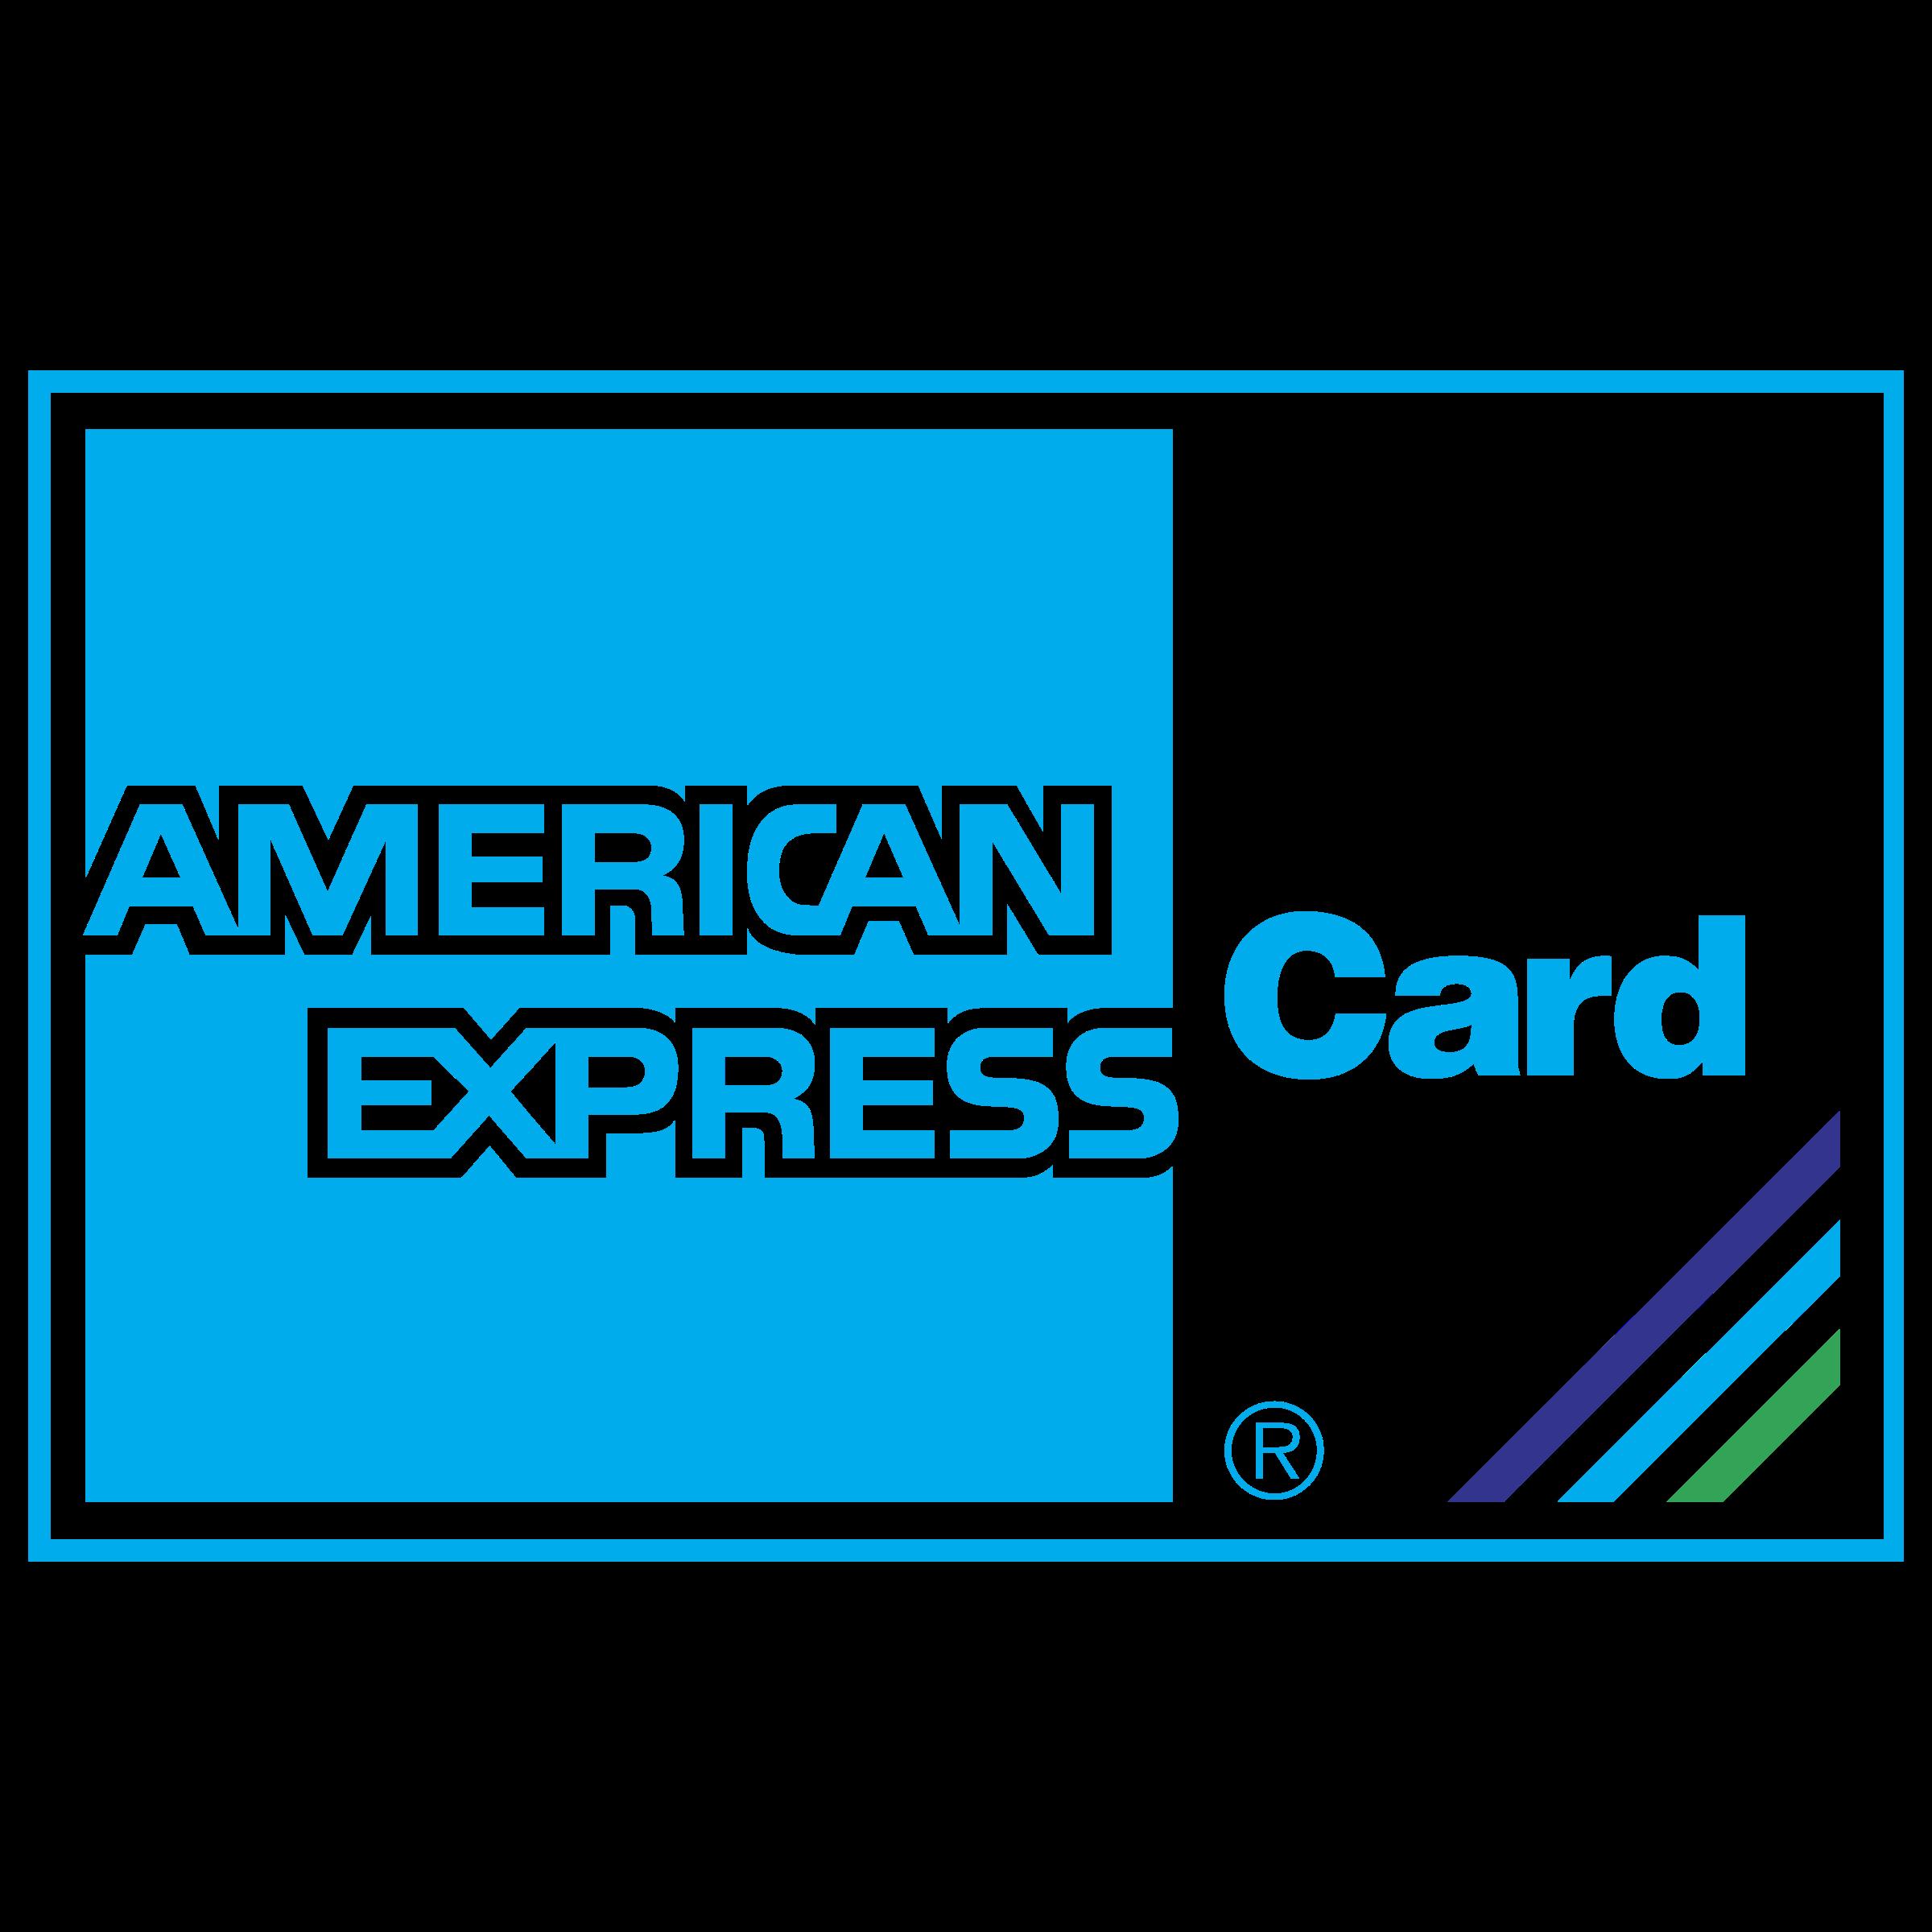 American Express Card Logo PNG Transparent & SVG Vector.